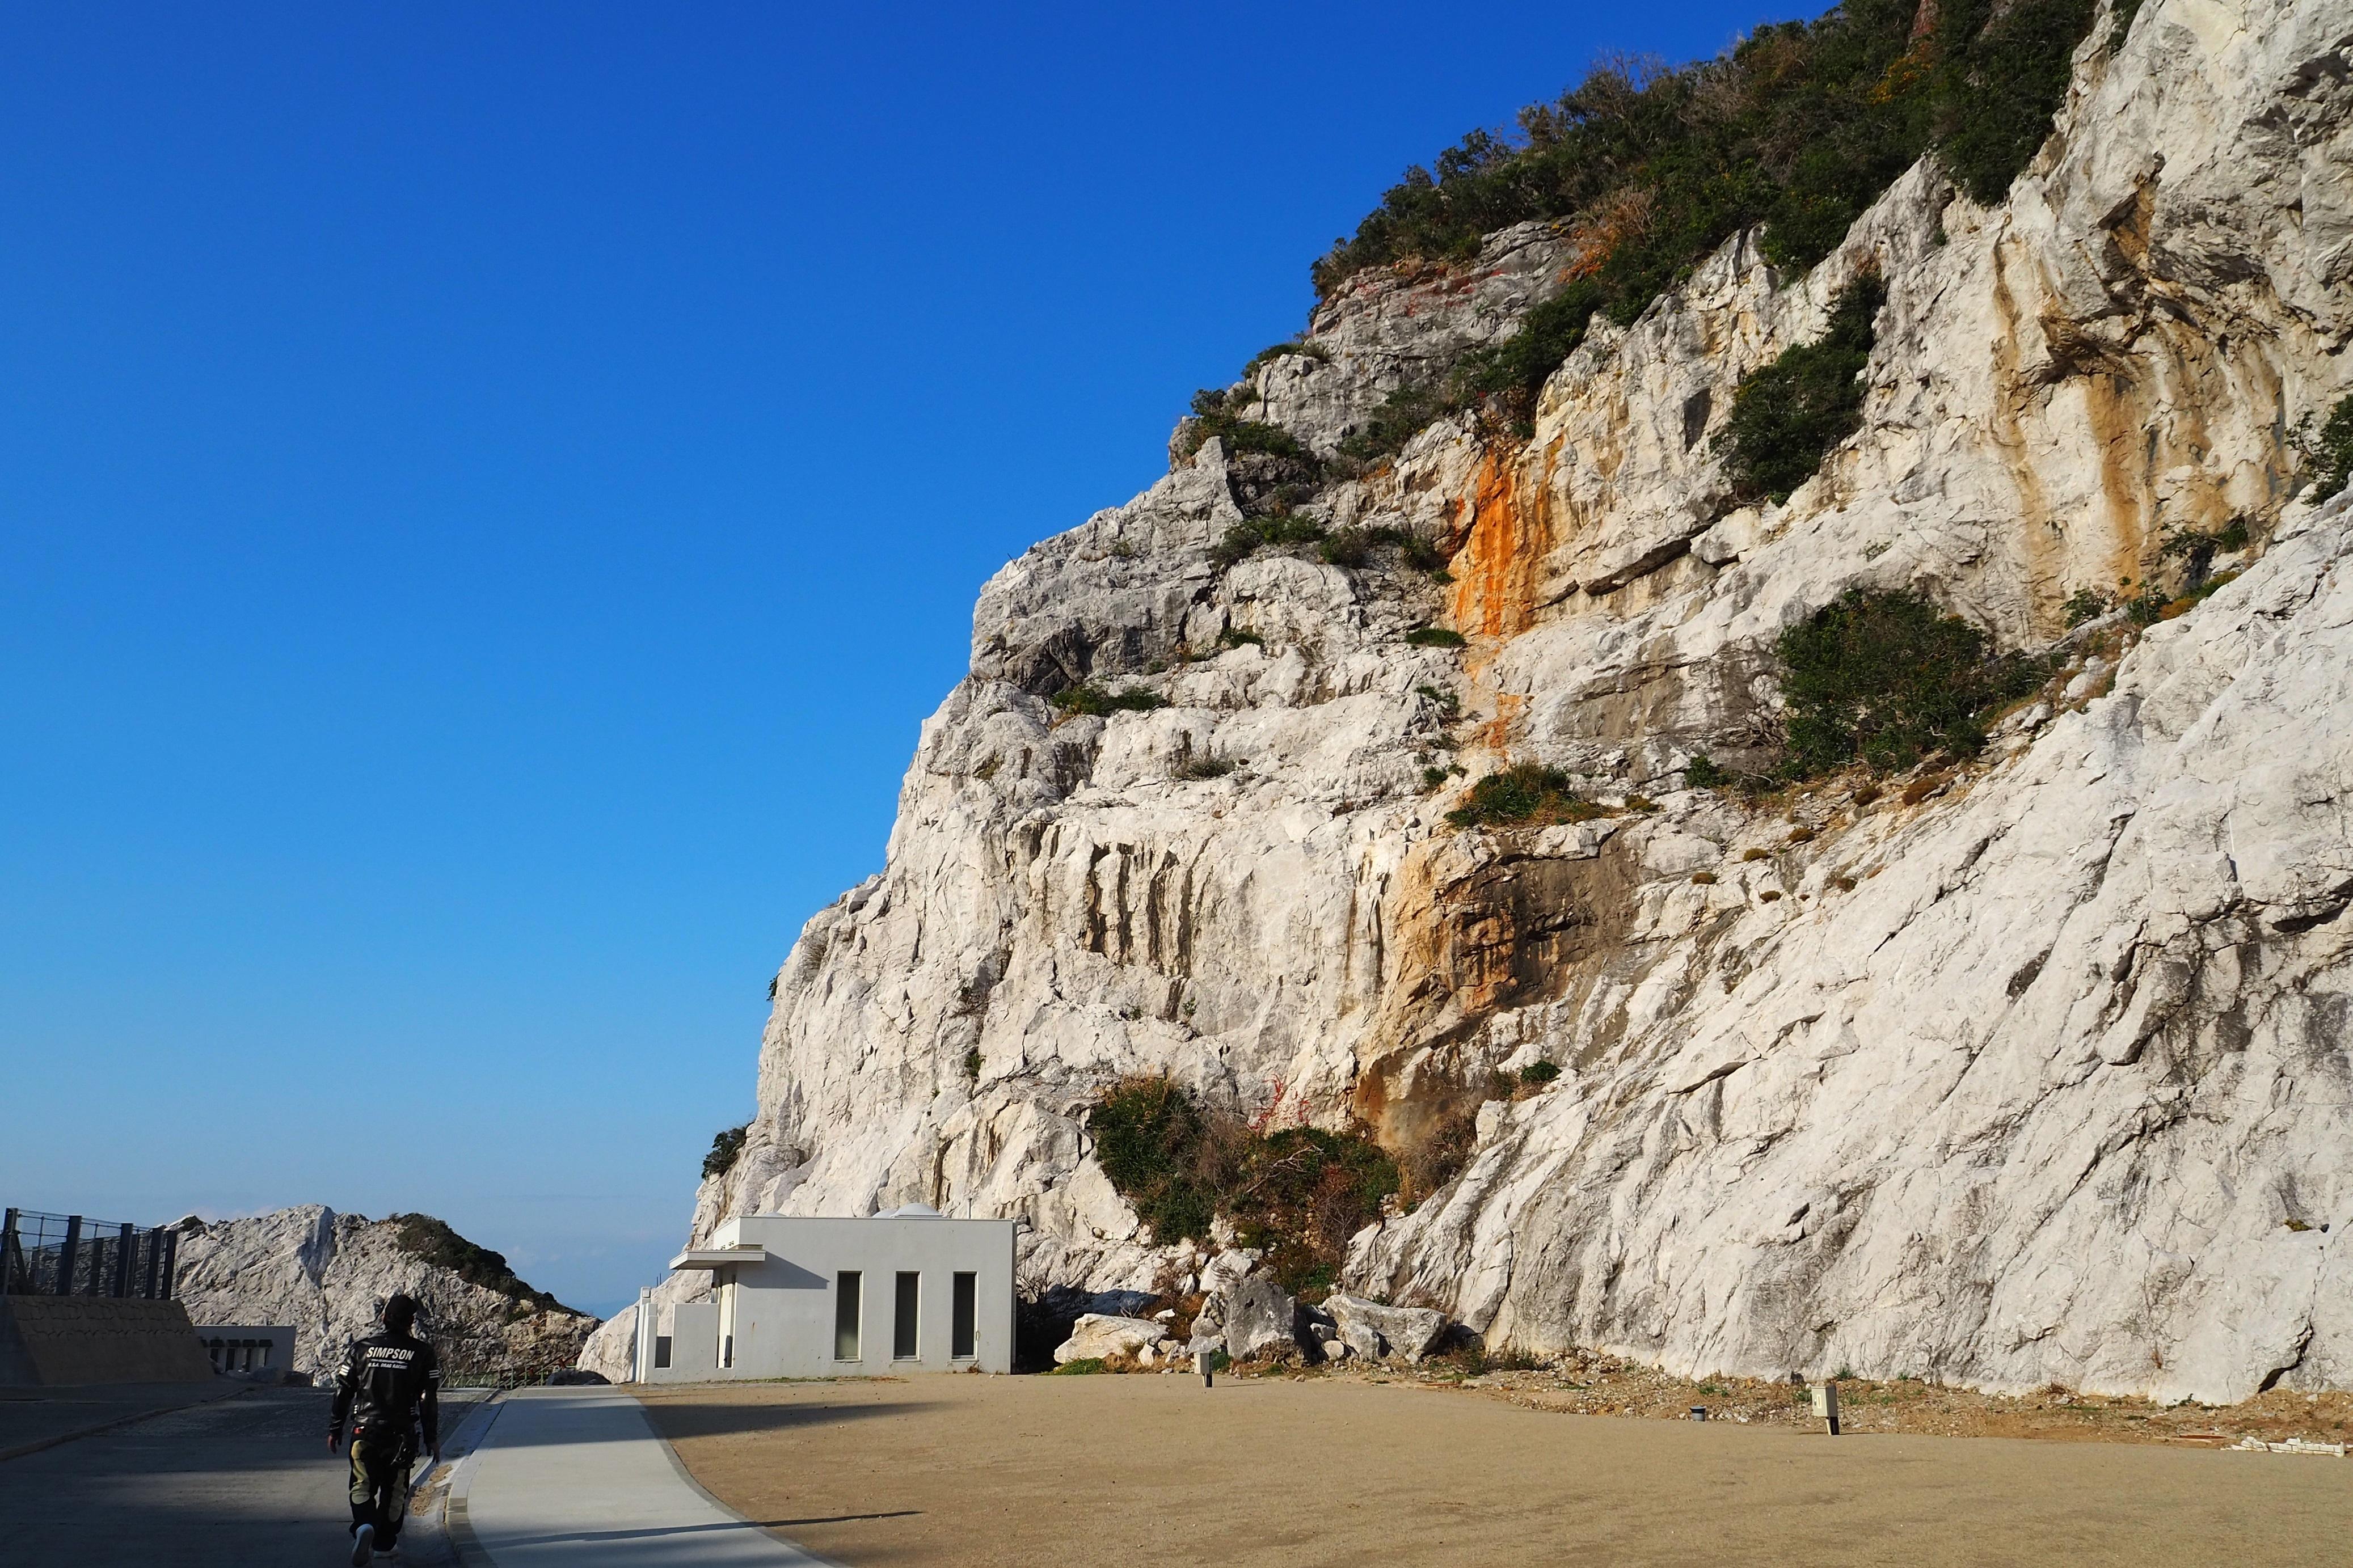 harleydavidson-motorcycle-touring-blog-wakayama-shirasakioceanpark-limestone.jpg